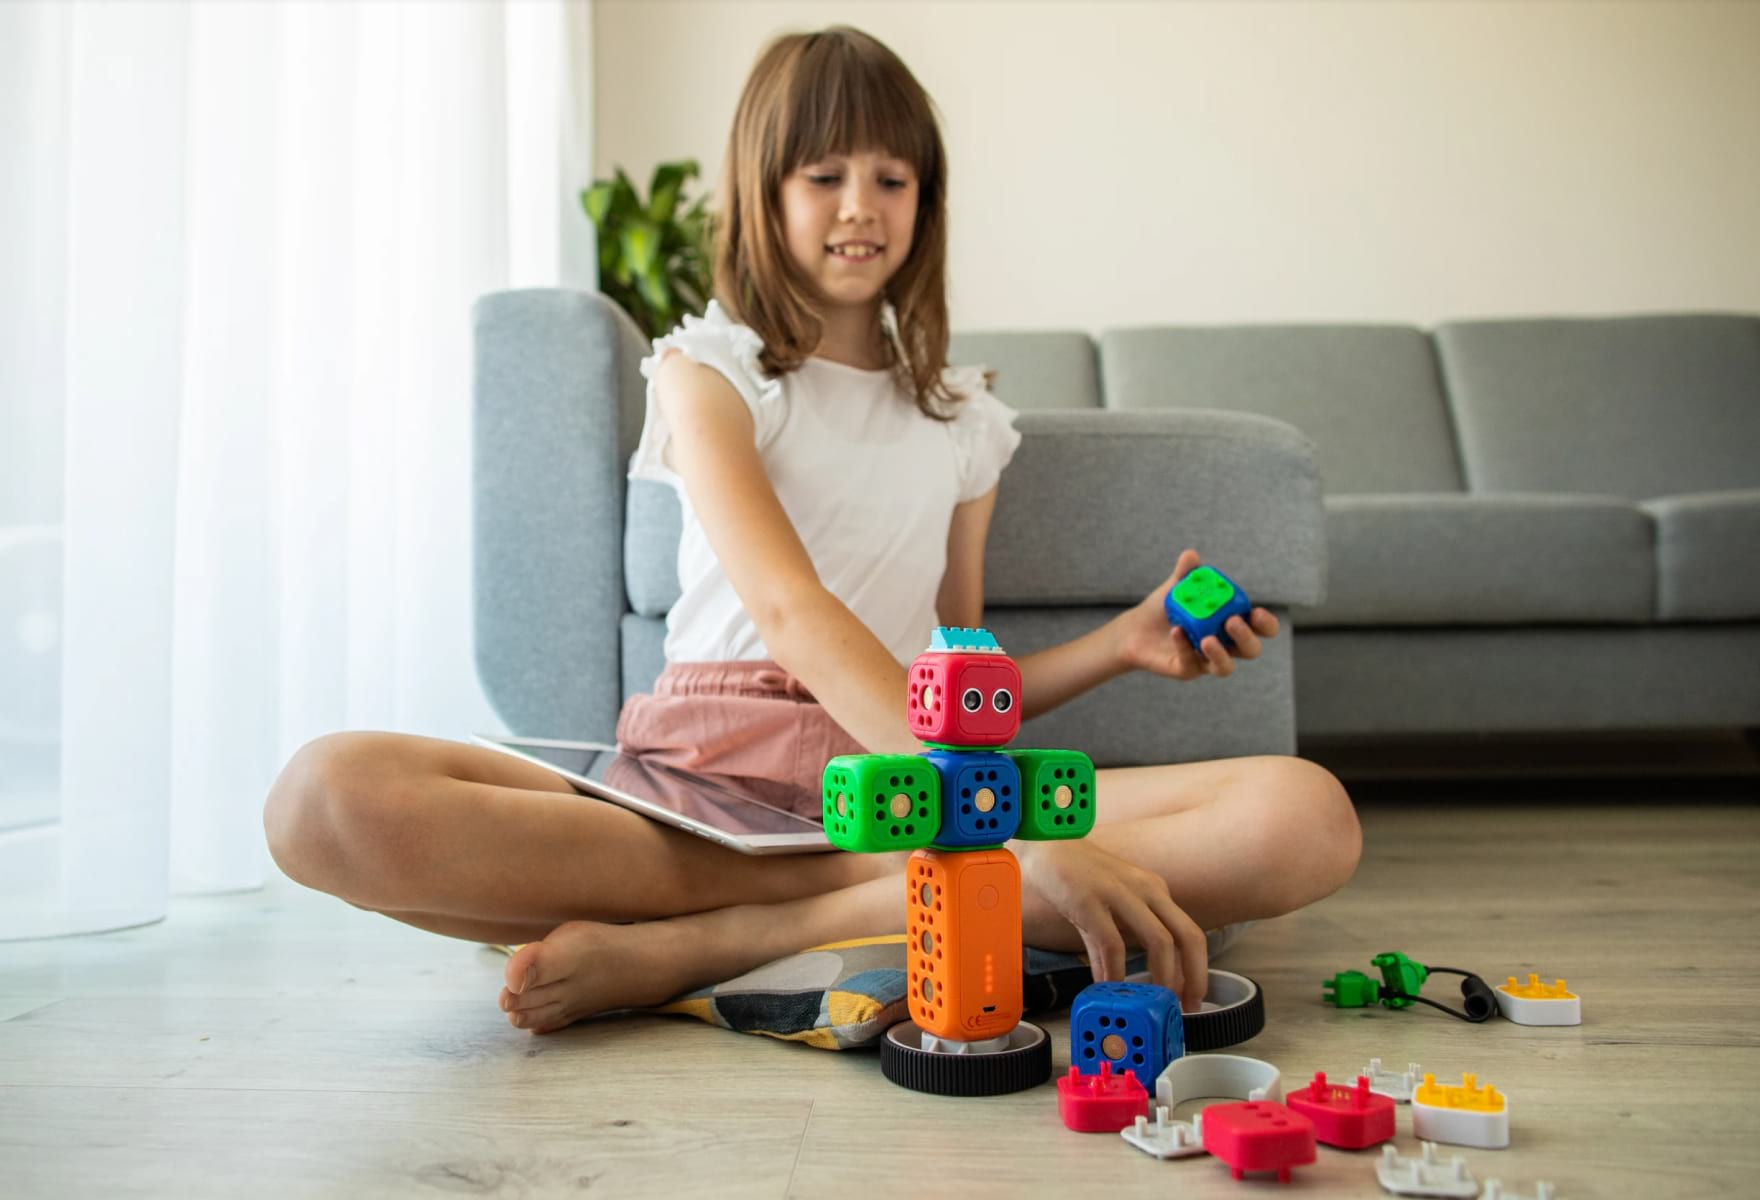 Robo Wunderkind coding apps & programmable robots for kids